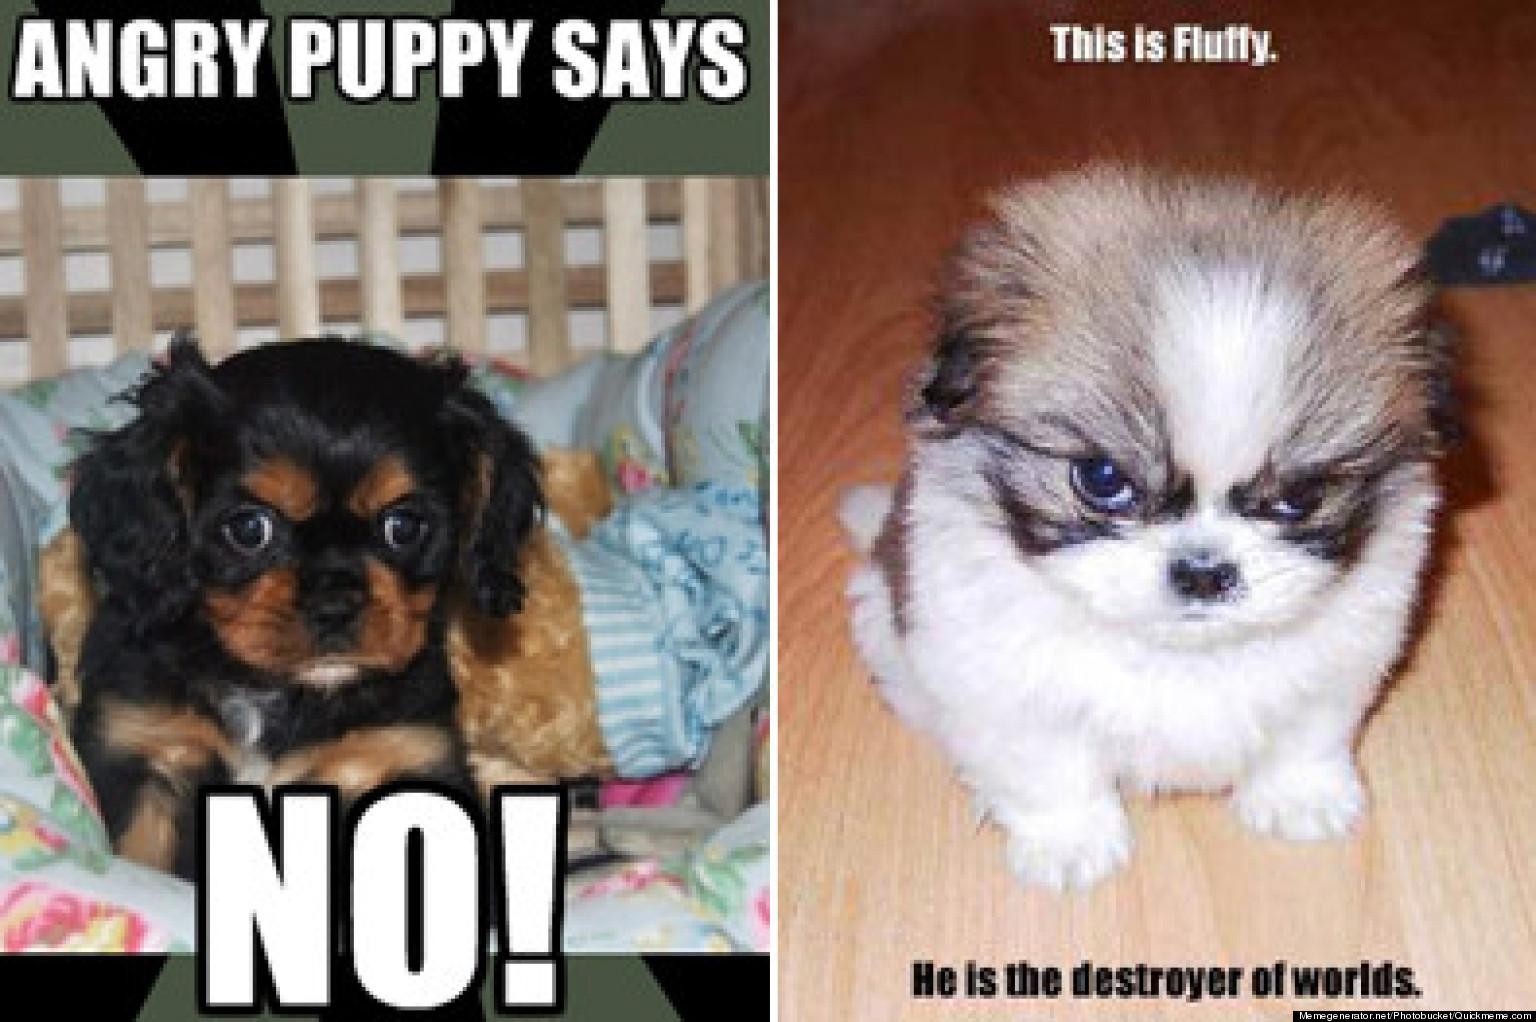 o ANGRY PUPPY MEME facebook photos cutest angry puppy meme contest huffpost,Angry Meme